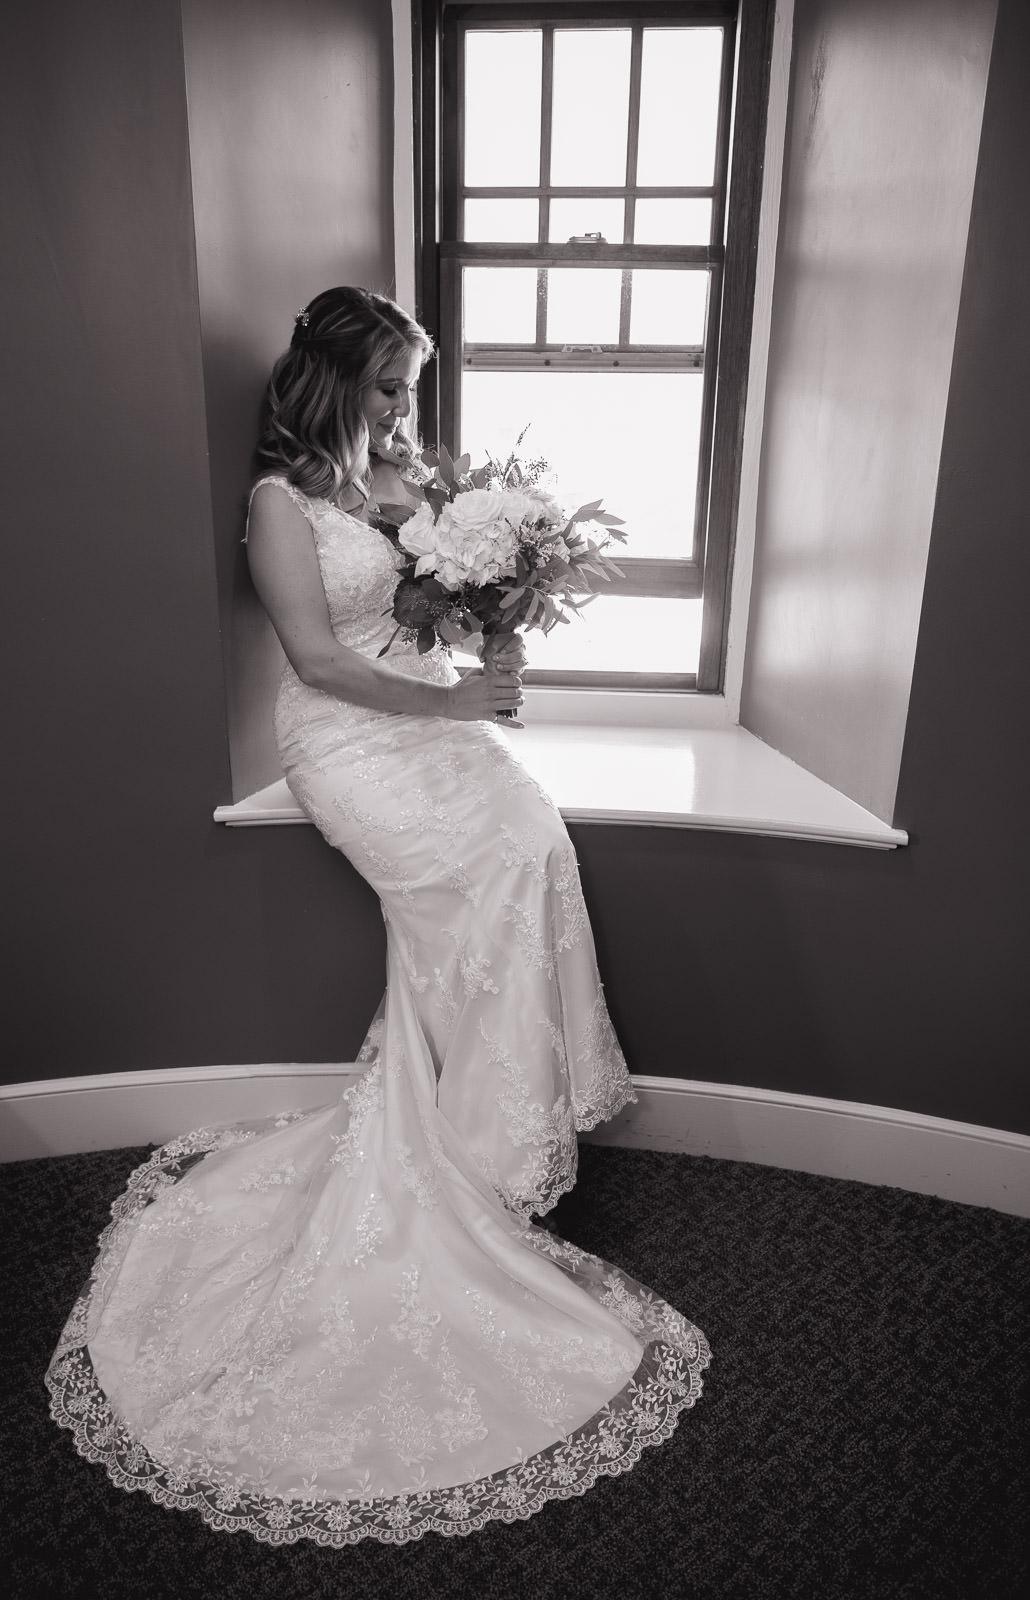 Wedding, Narragansett Towers, The Towers, Narragansett, Rhode Island, RI, Tracy Jenkins photography, RI wedding photographer, Rhode Island wedding photographer, bridal portrait